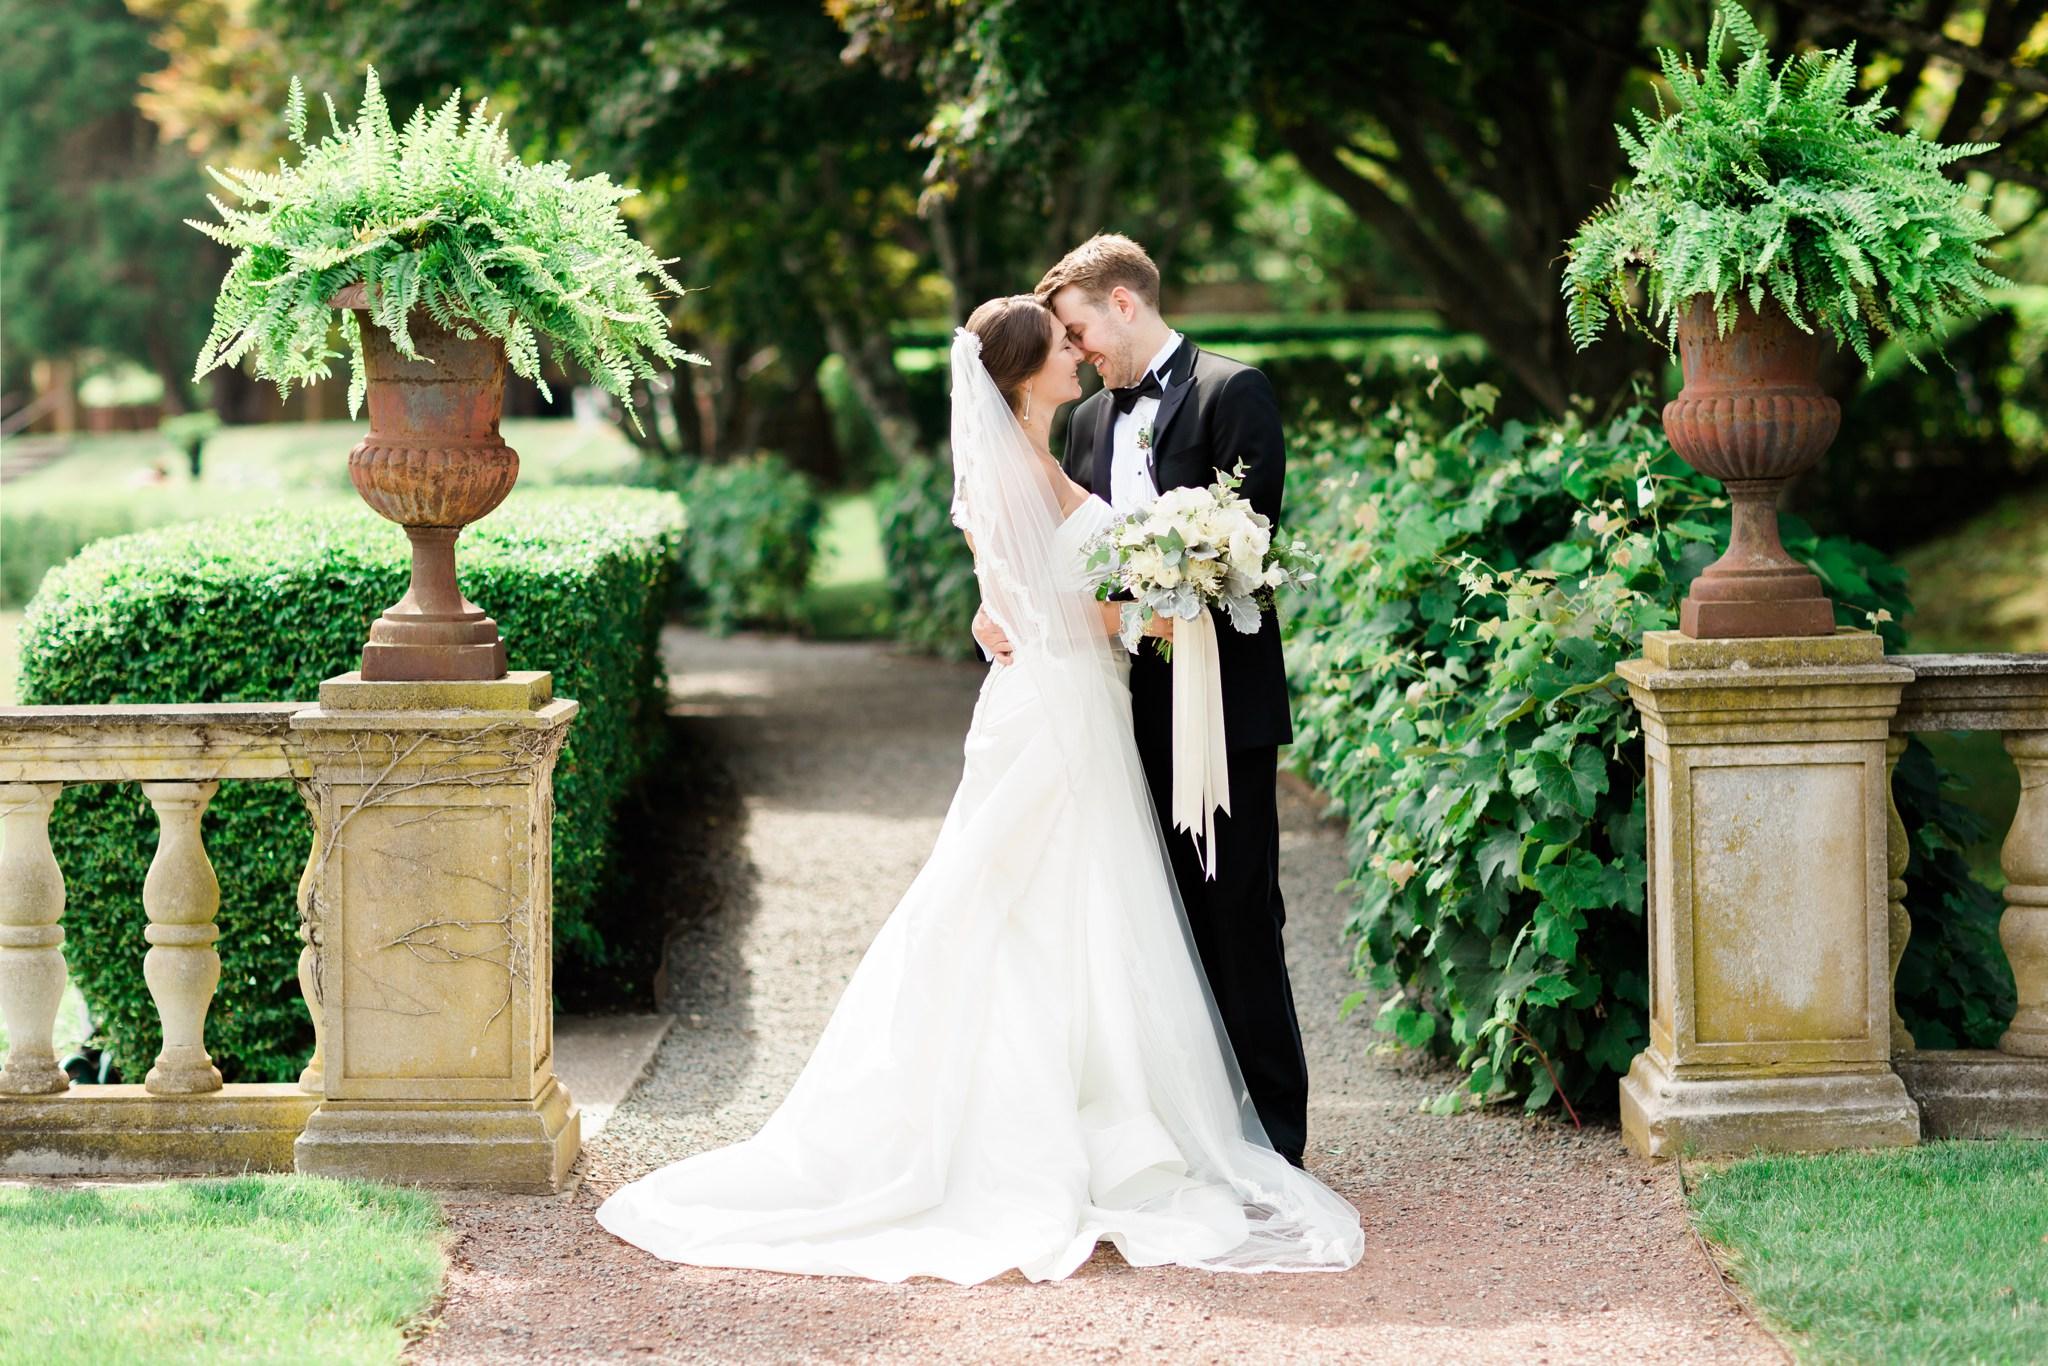 turner_hill_wedding_photos_00031.JPG